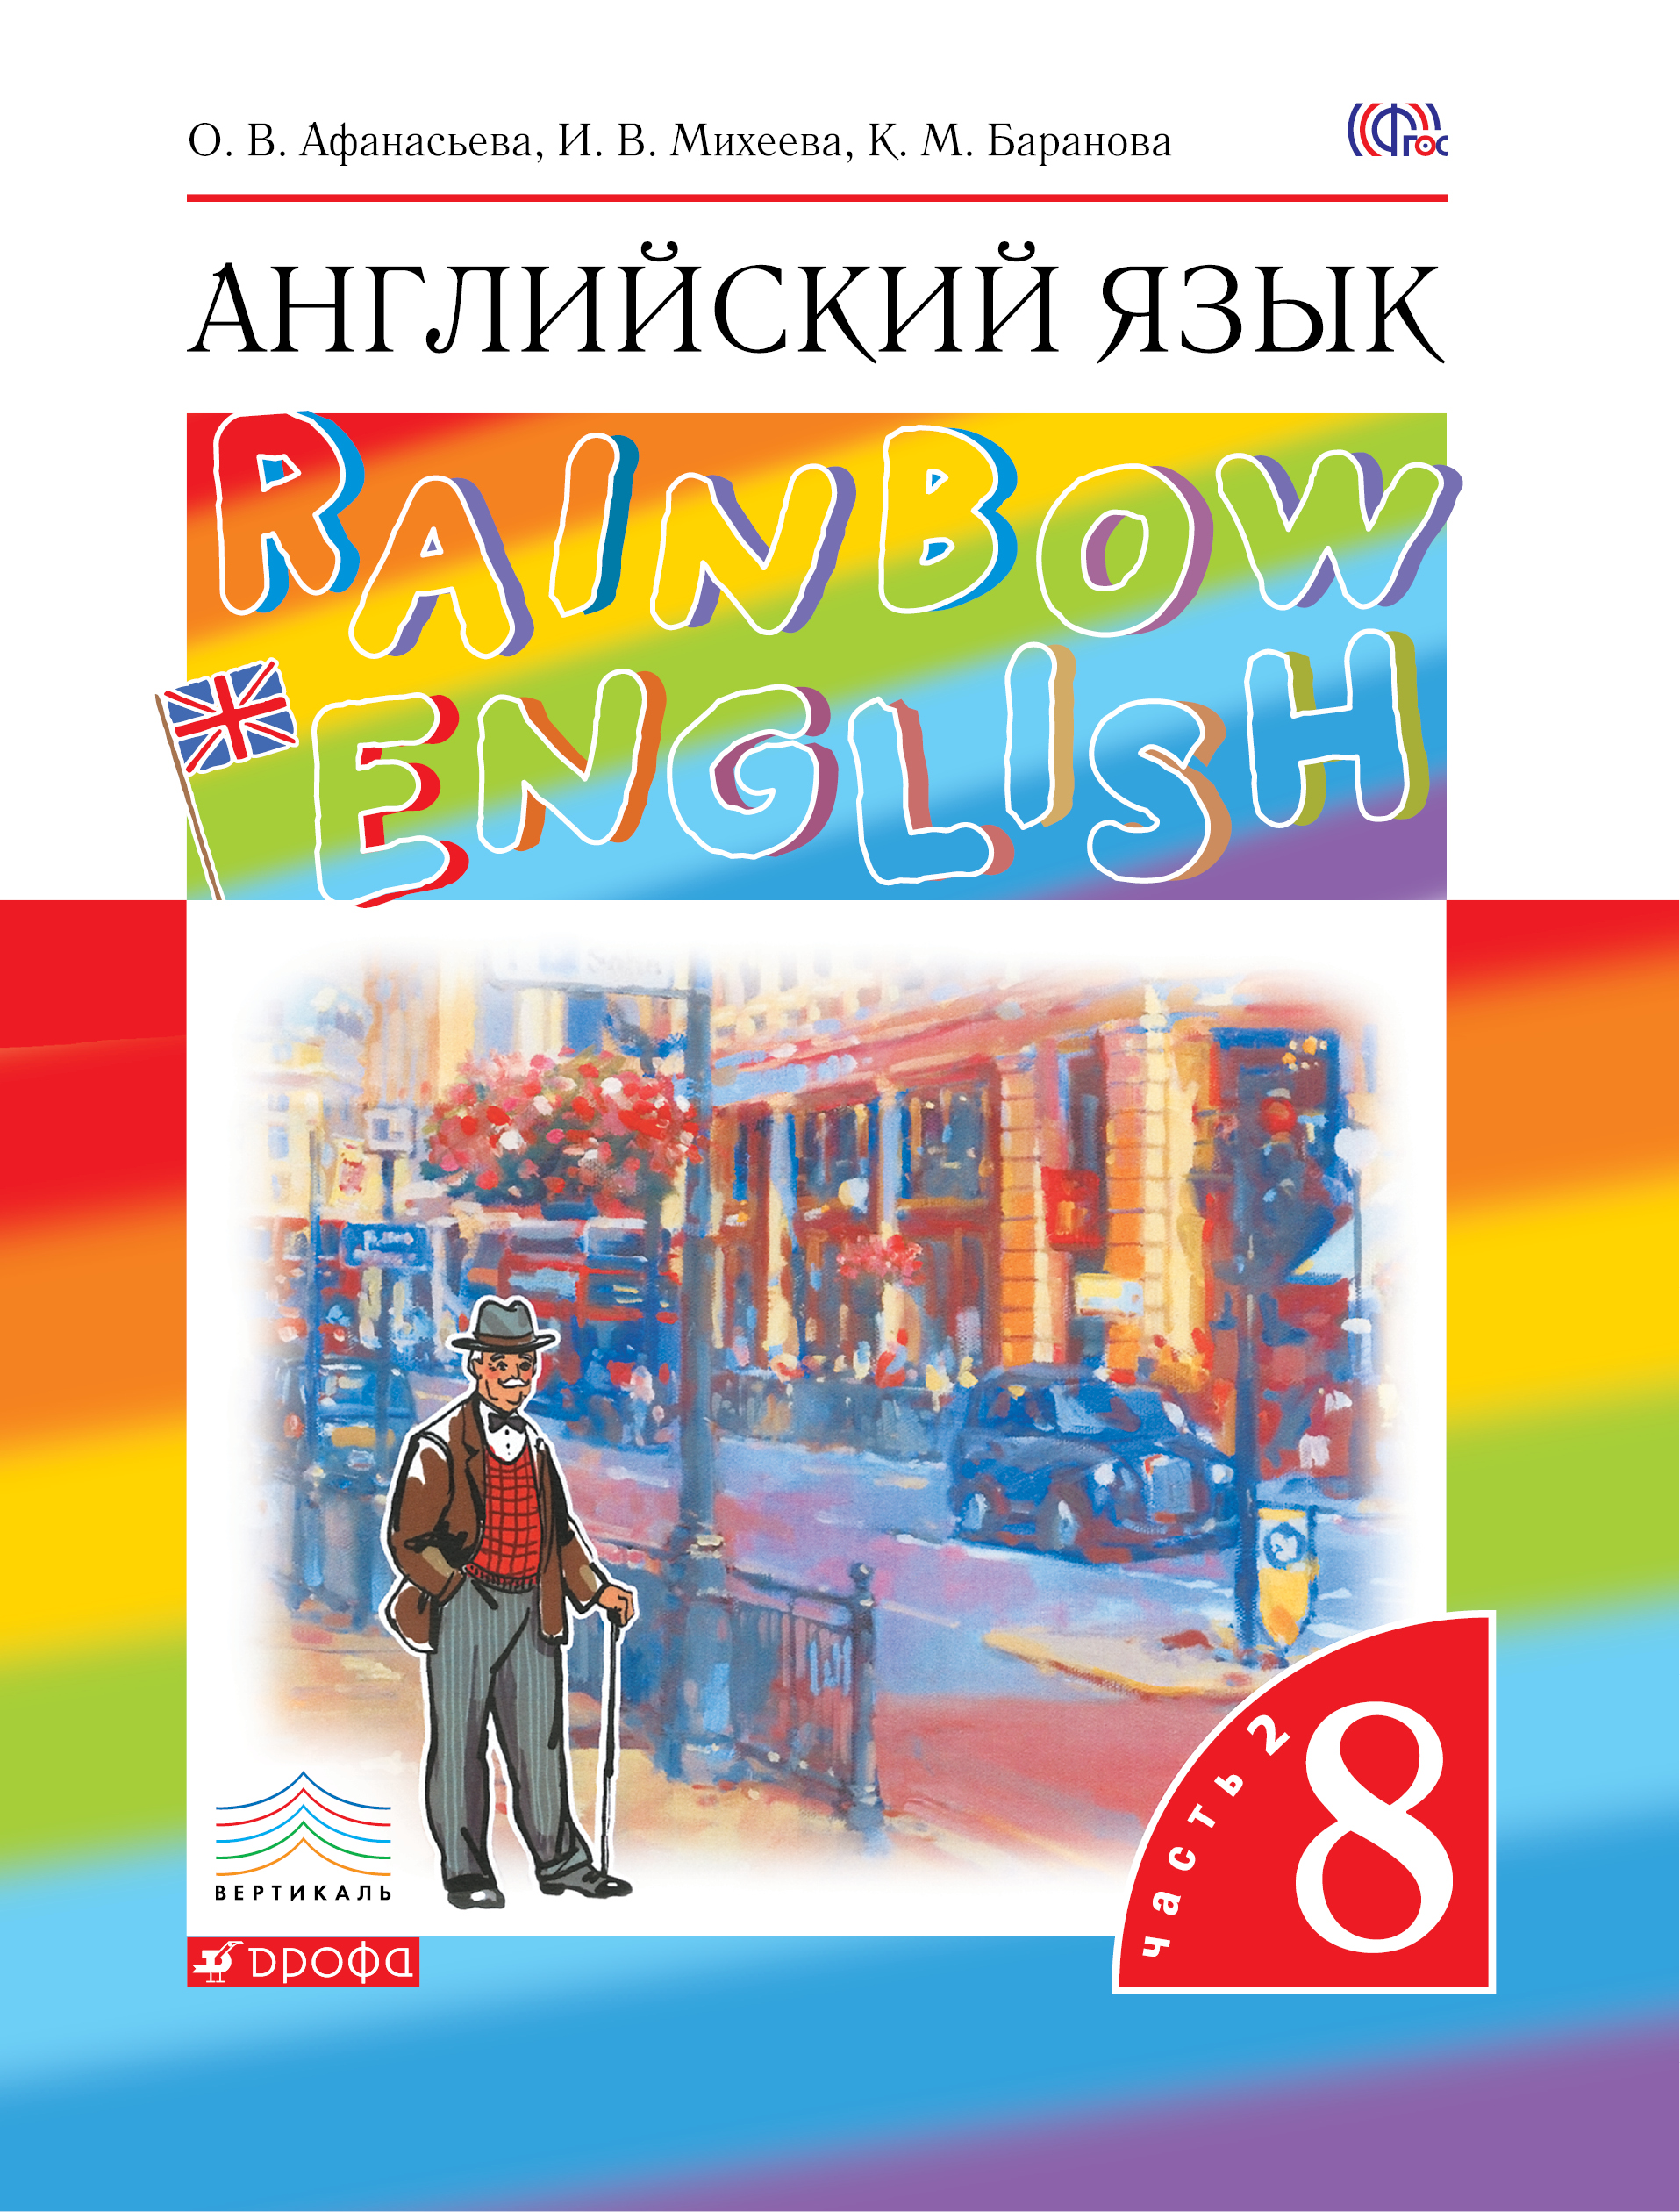 fb2 английский язык 8 класс учебник